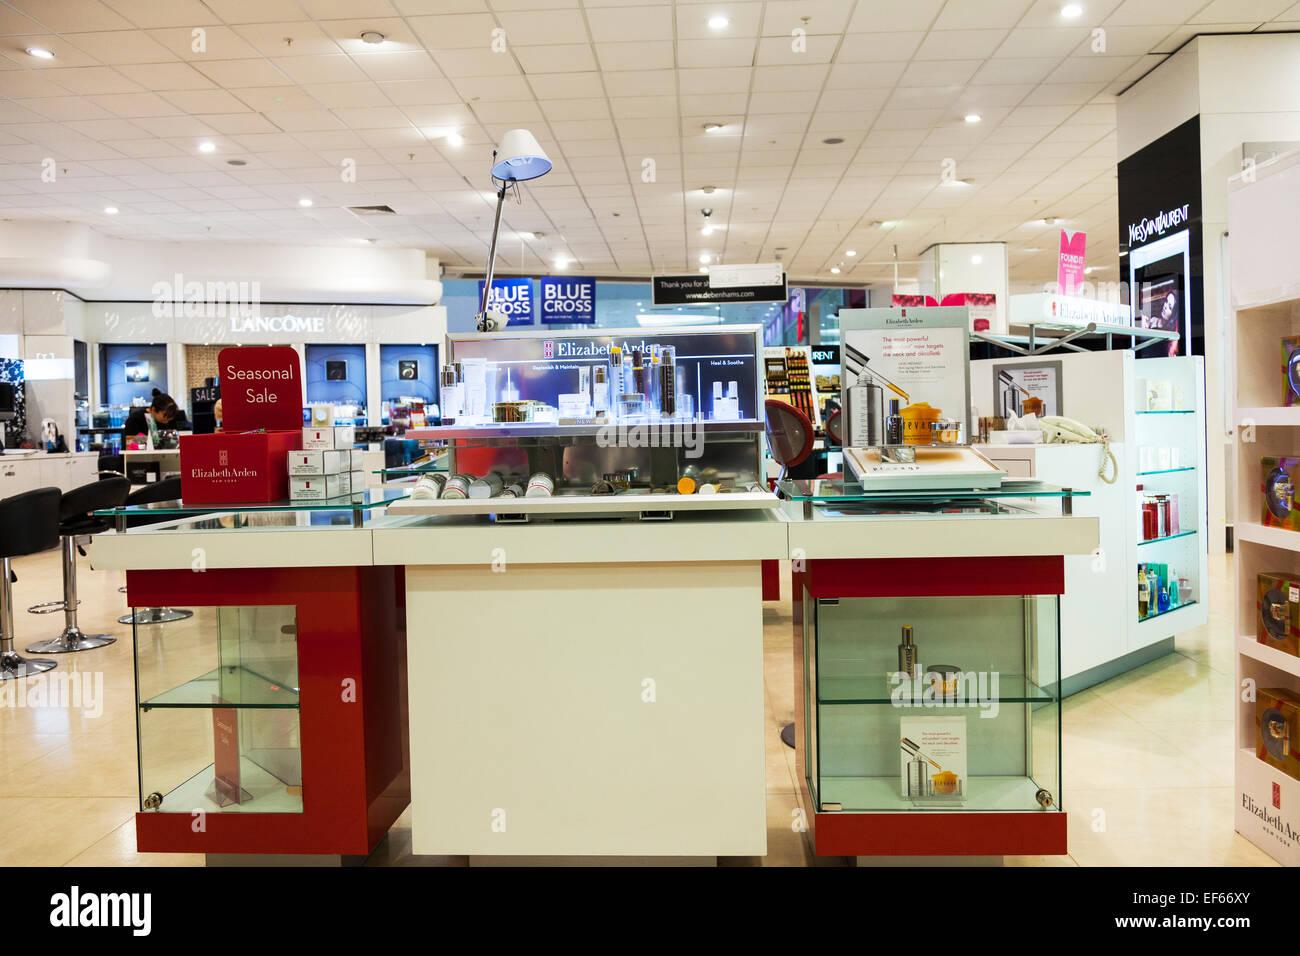 House of Fraser perfume and makeup department Lancome Elizabeth Arden Yves saint Laurent UK England shop store inside - Stock Image